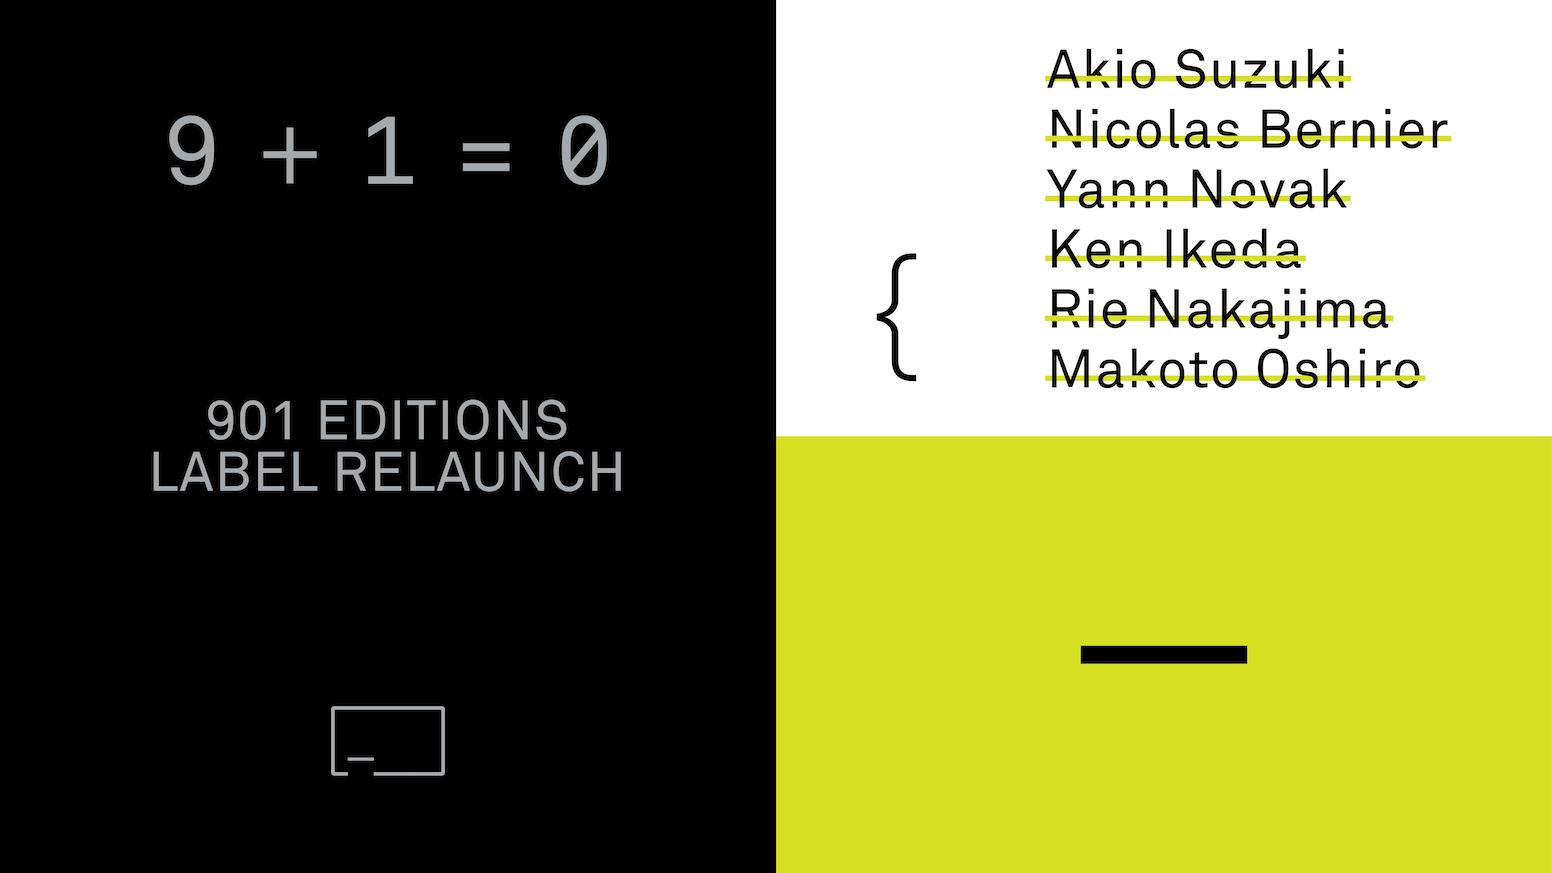 901 Editions relaunch with 4 new releases by Akio Suzuki, Nicolas Bernier, Yann Novak, & Ken Ikeda + Rie Nakajima + Makoto Oshiro.